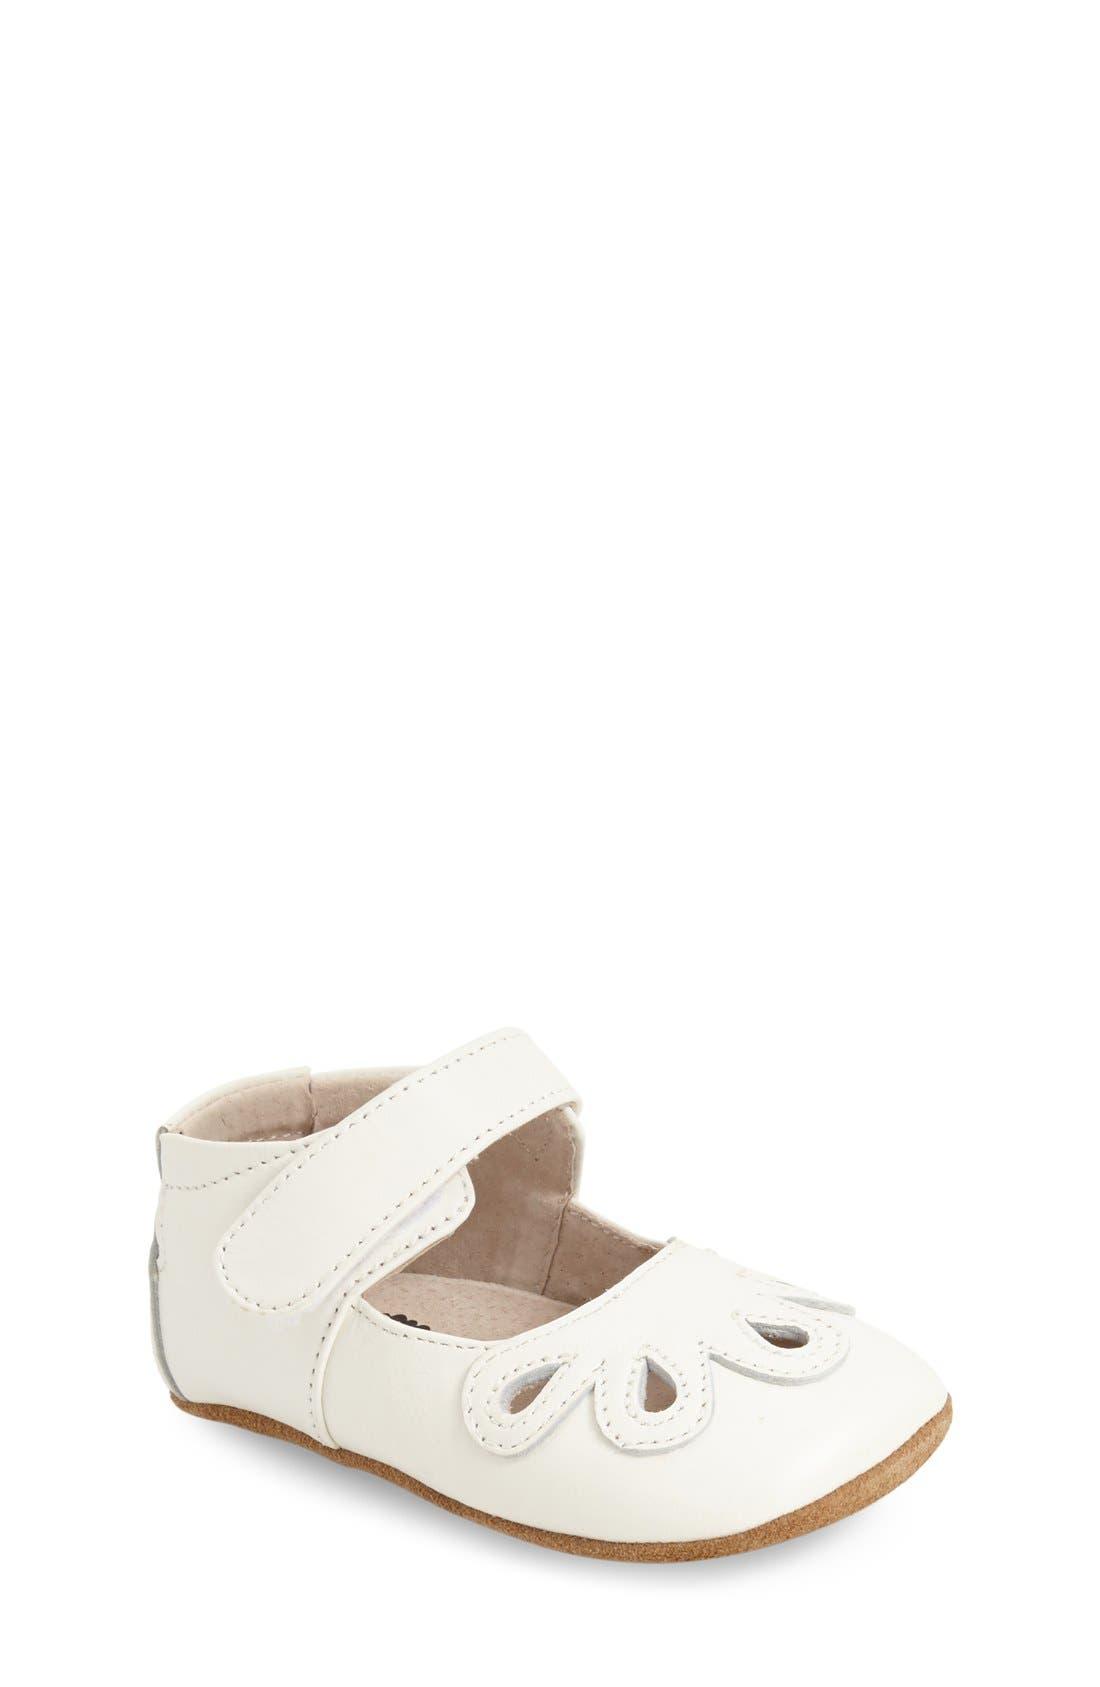 Livie & Luca 'Petal' Mary Jane Crib Shoe (Baby & Walker)